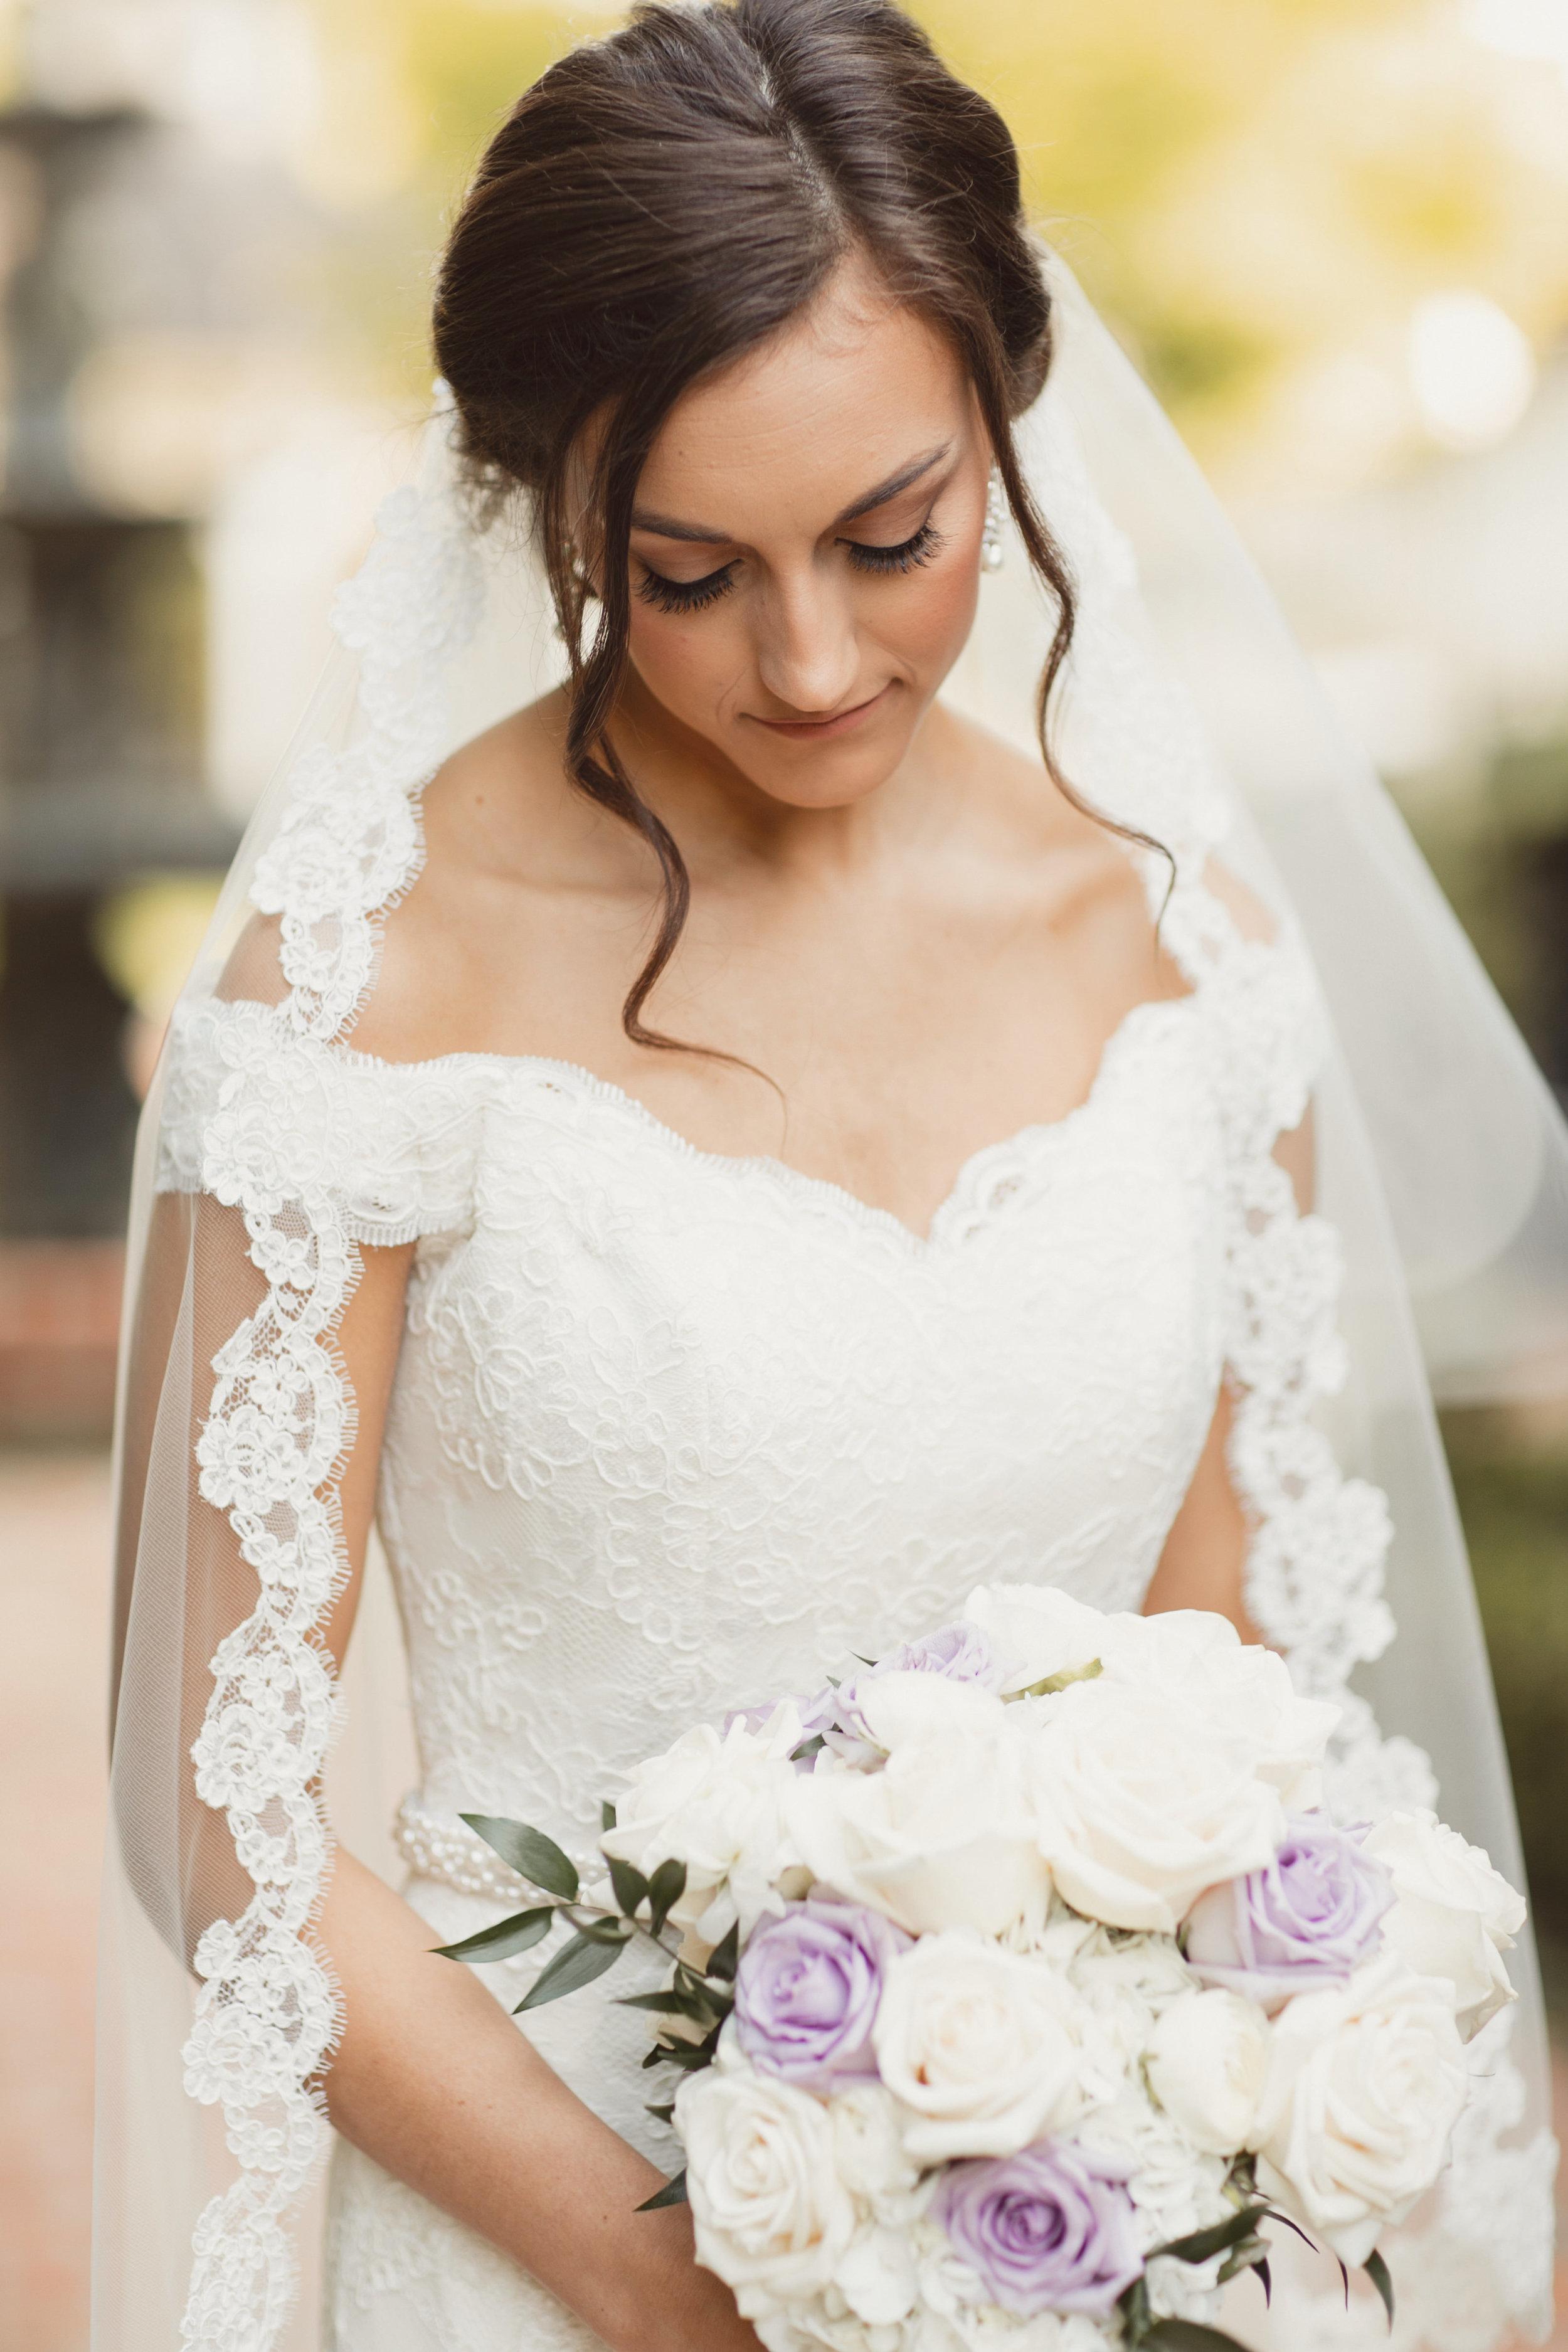 Citron_Bergeron_wedding-0260.jpg